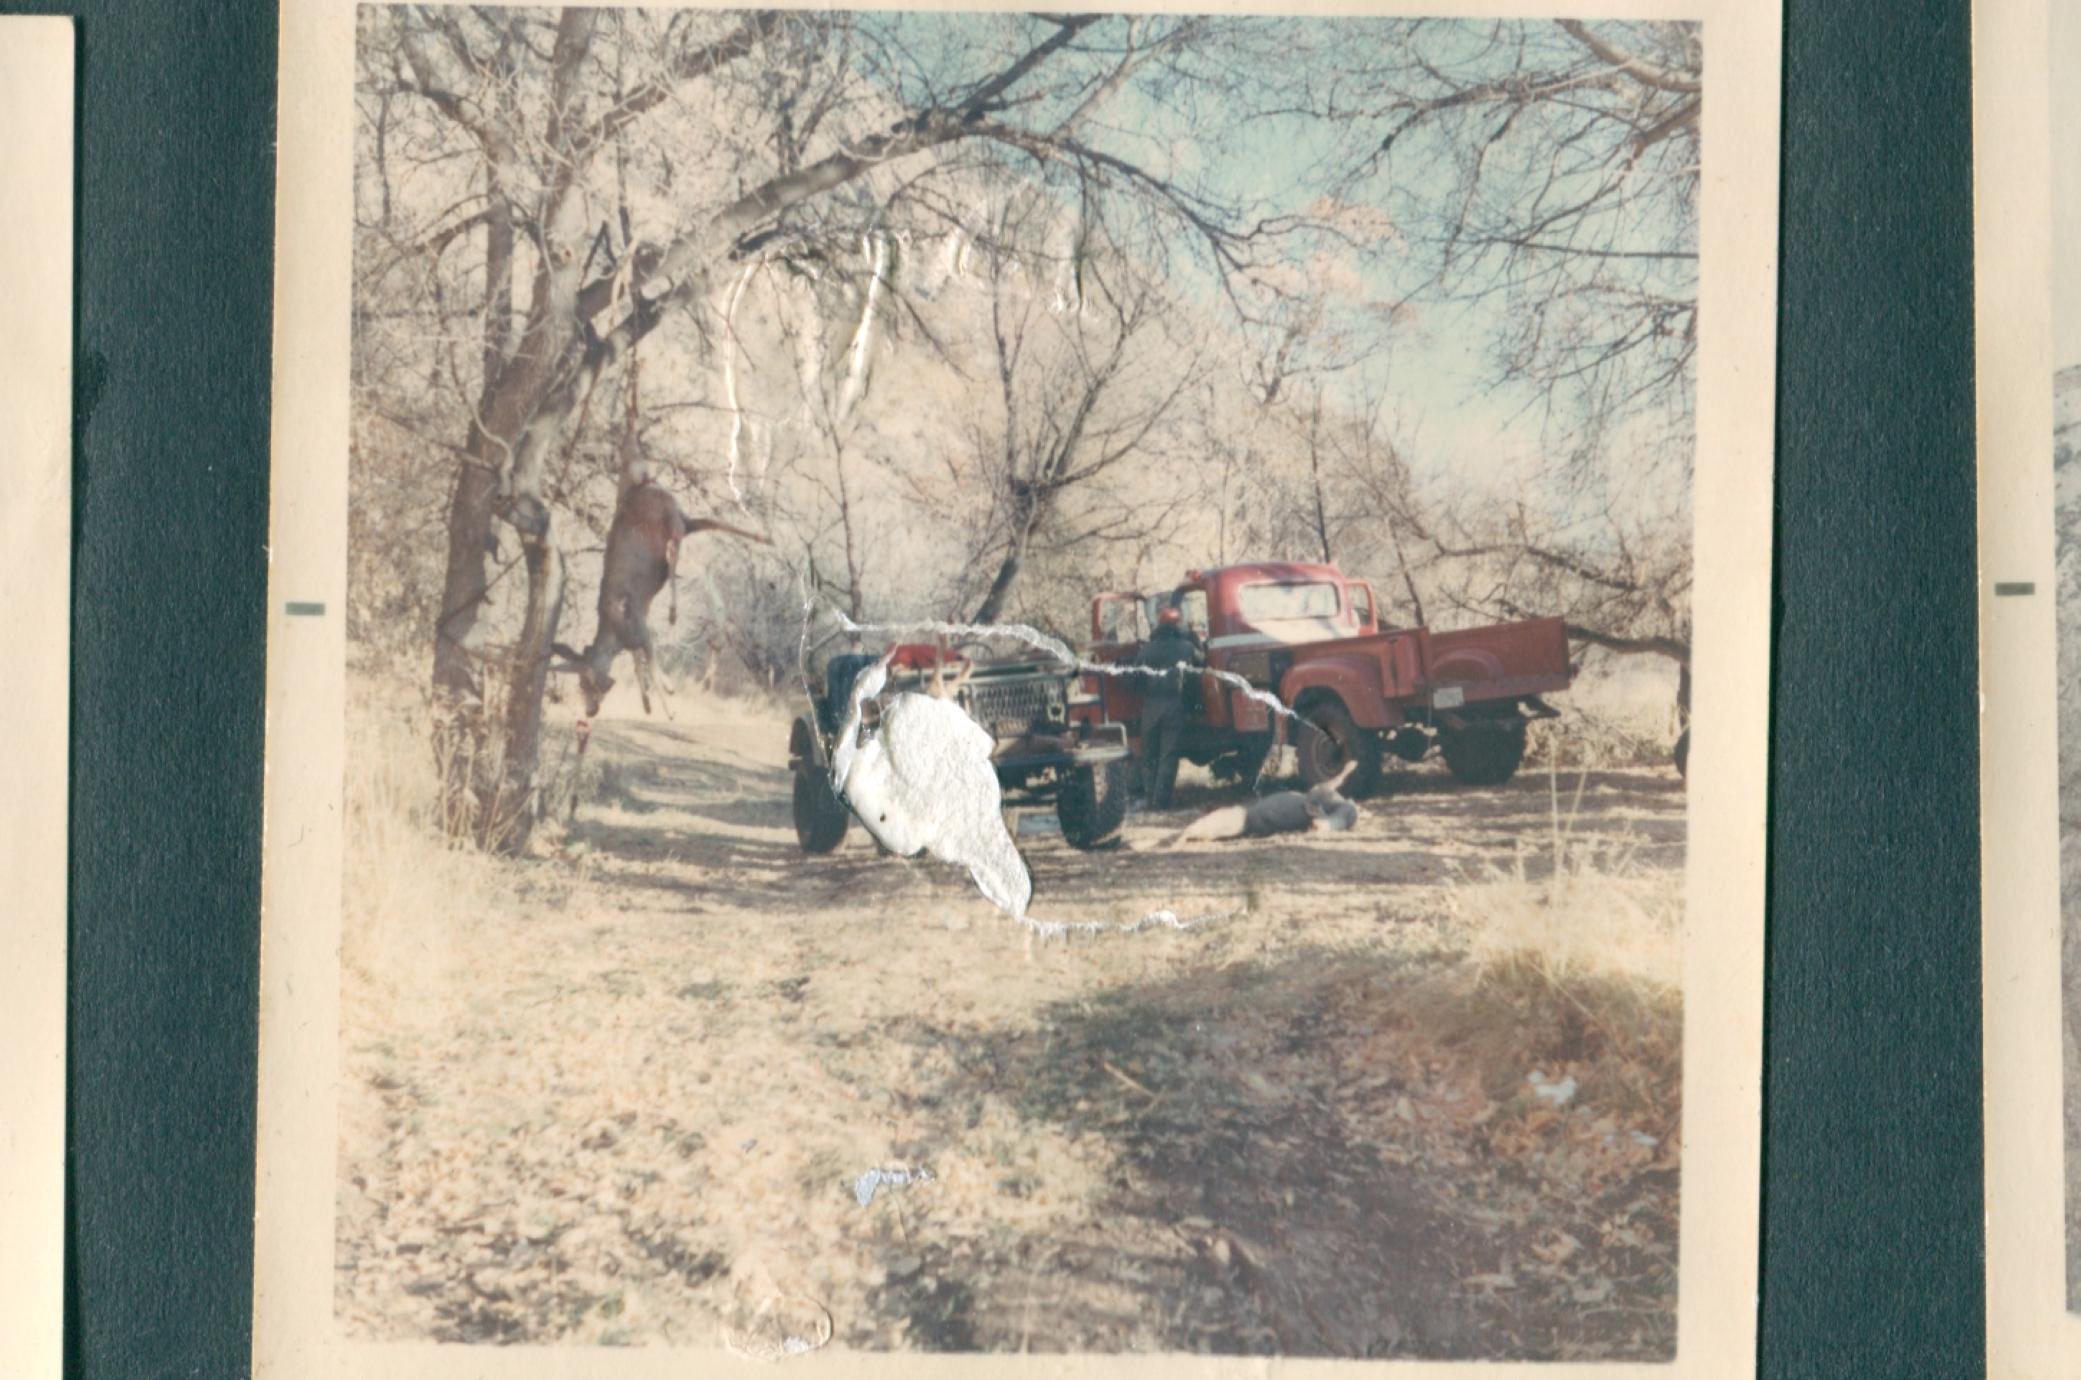 1956 international harvester tow truck 4